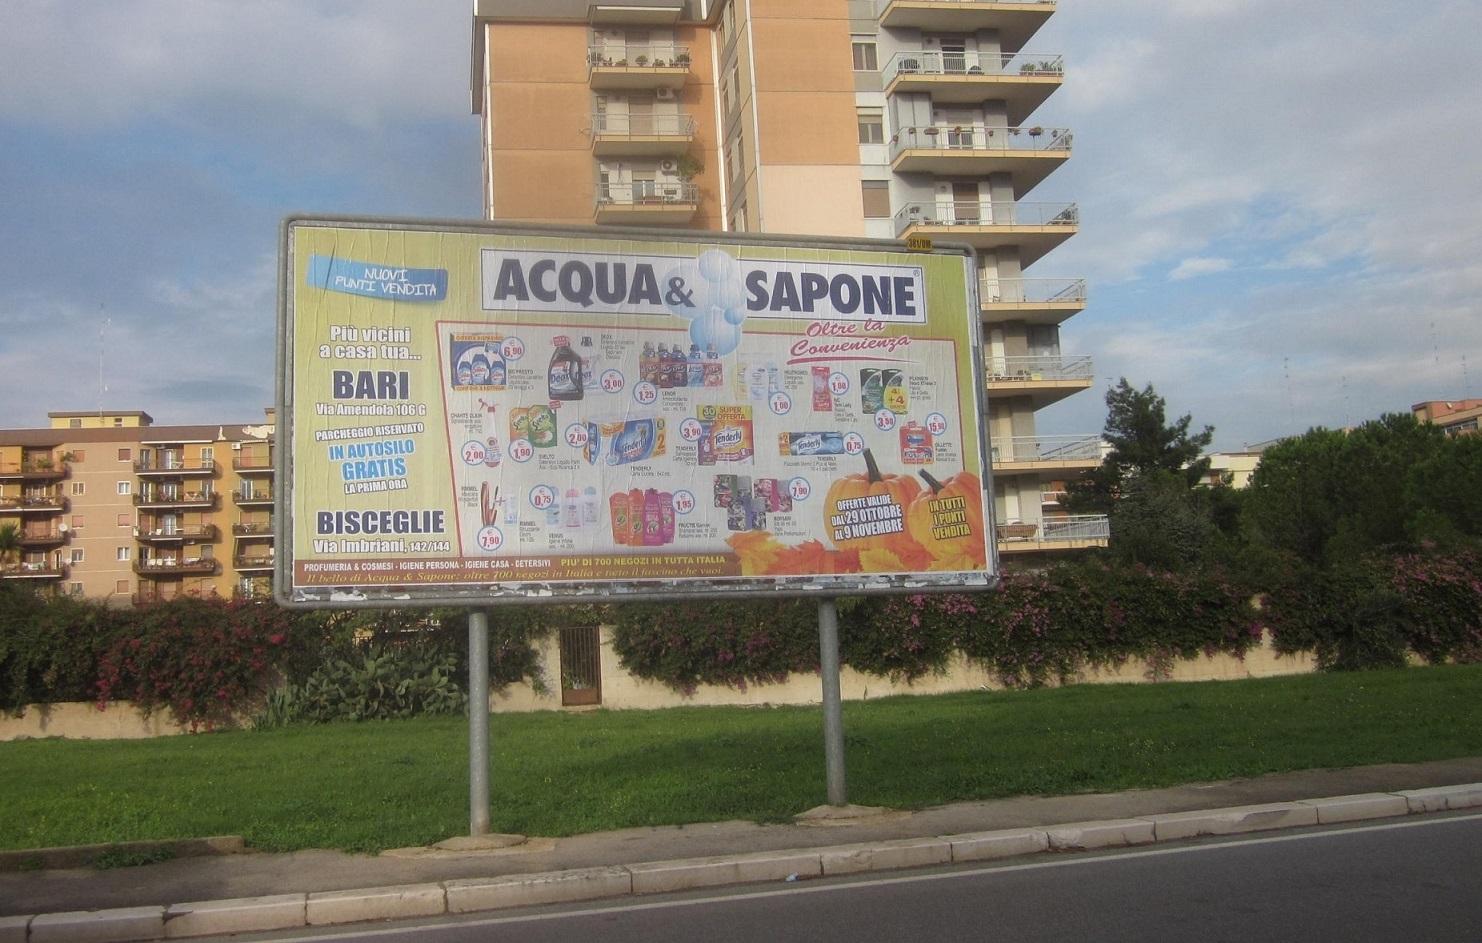 http://www.postermap.it/wp-content/uploads/2015/10/1barletta.jpg